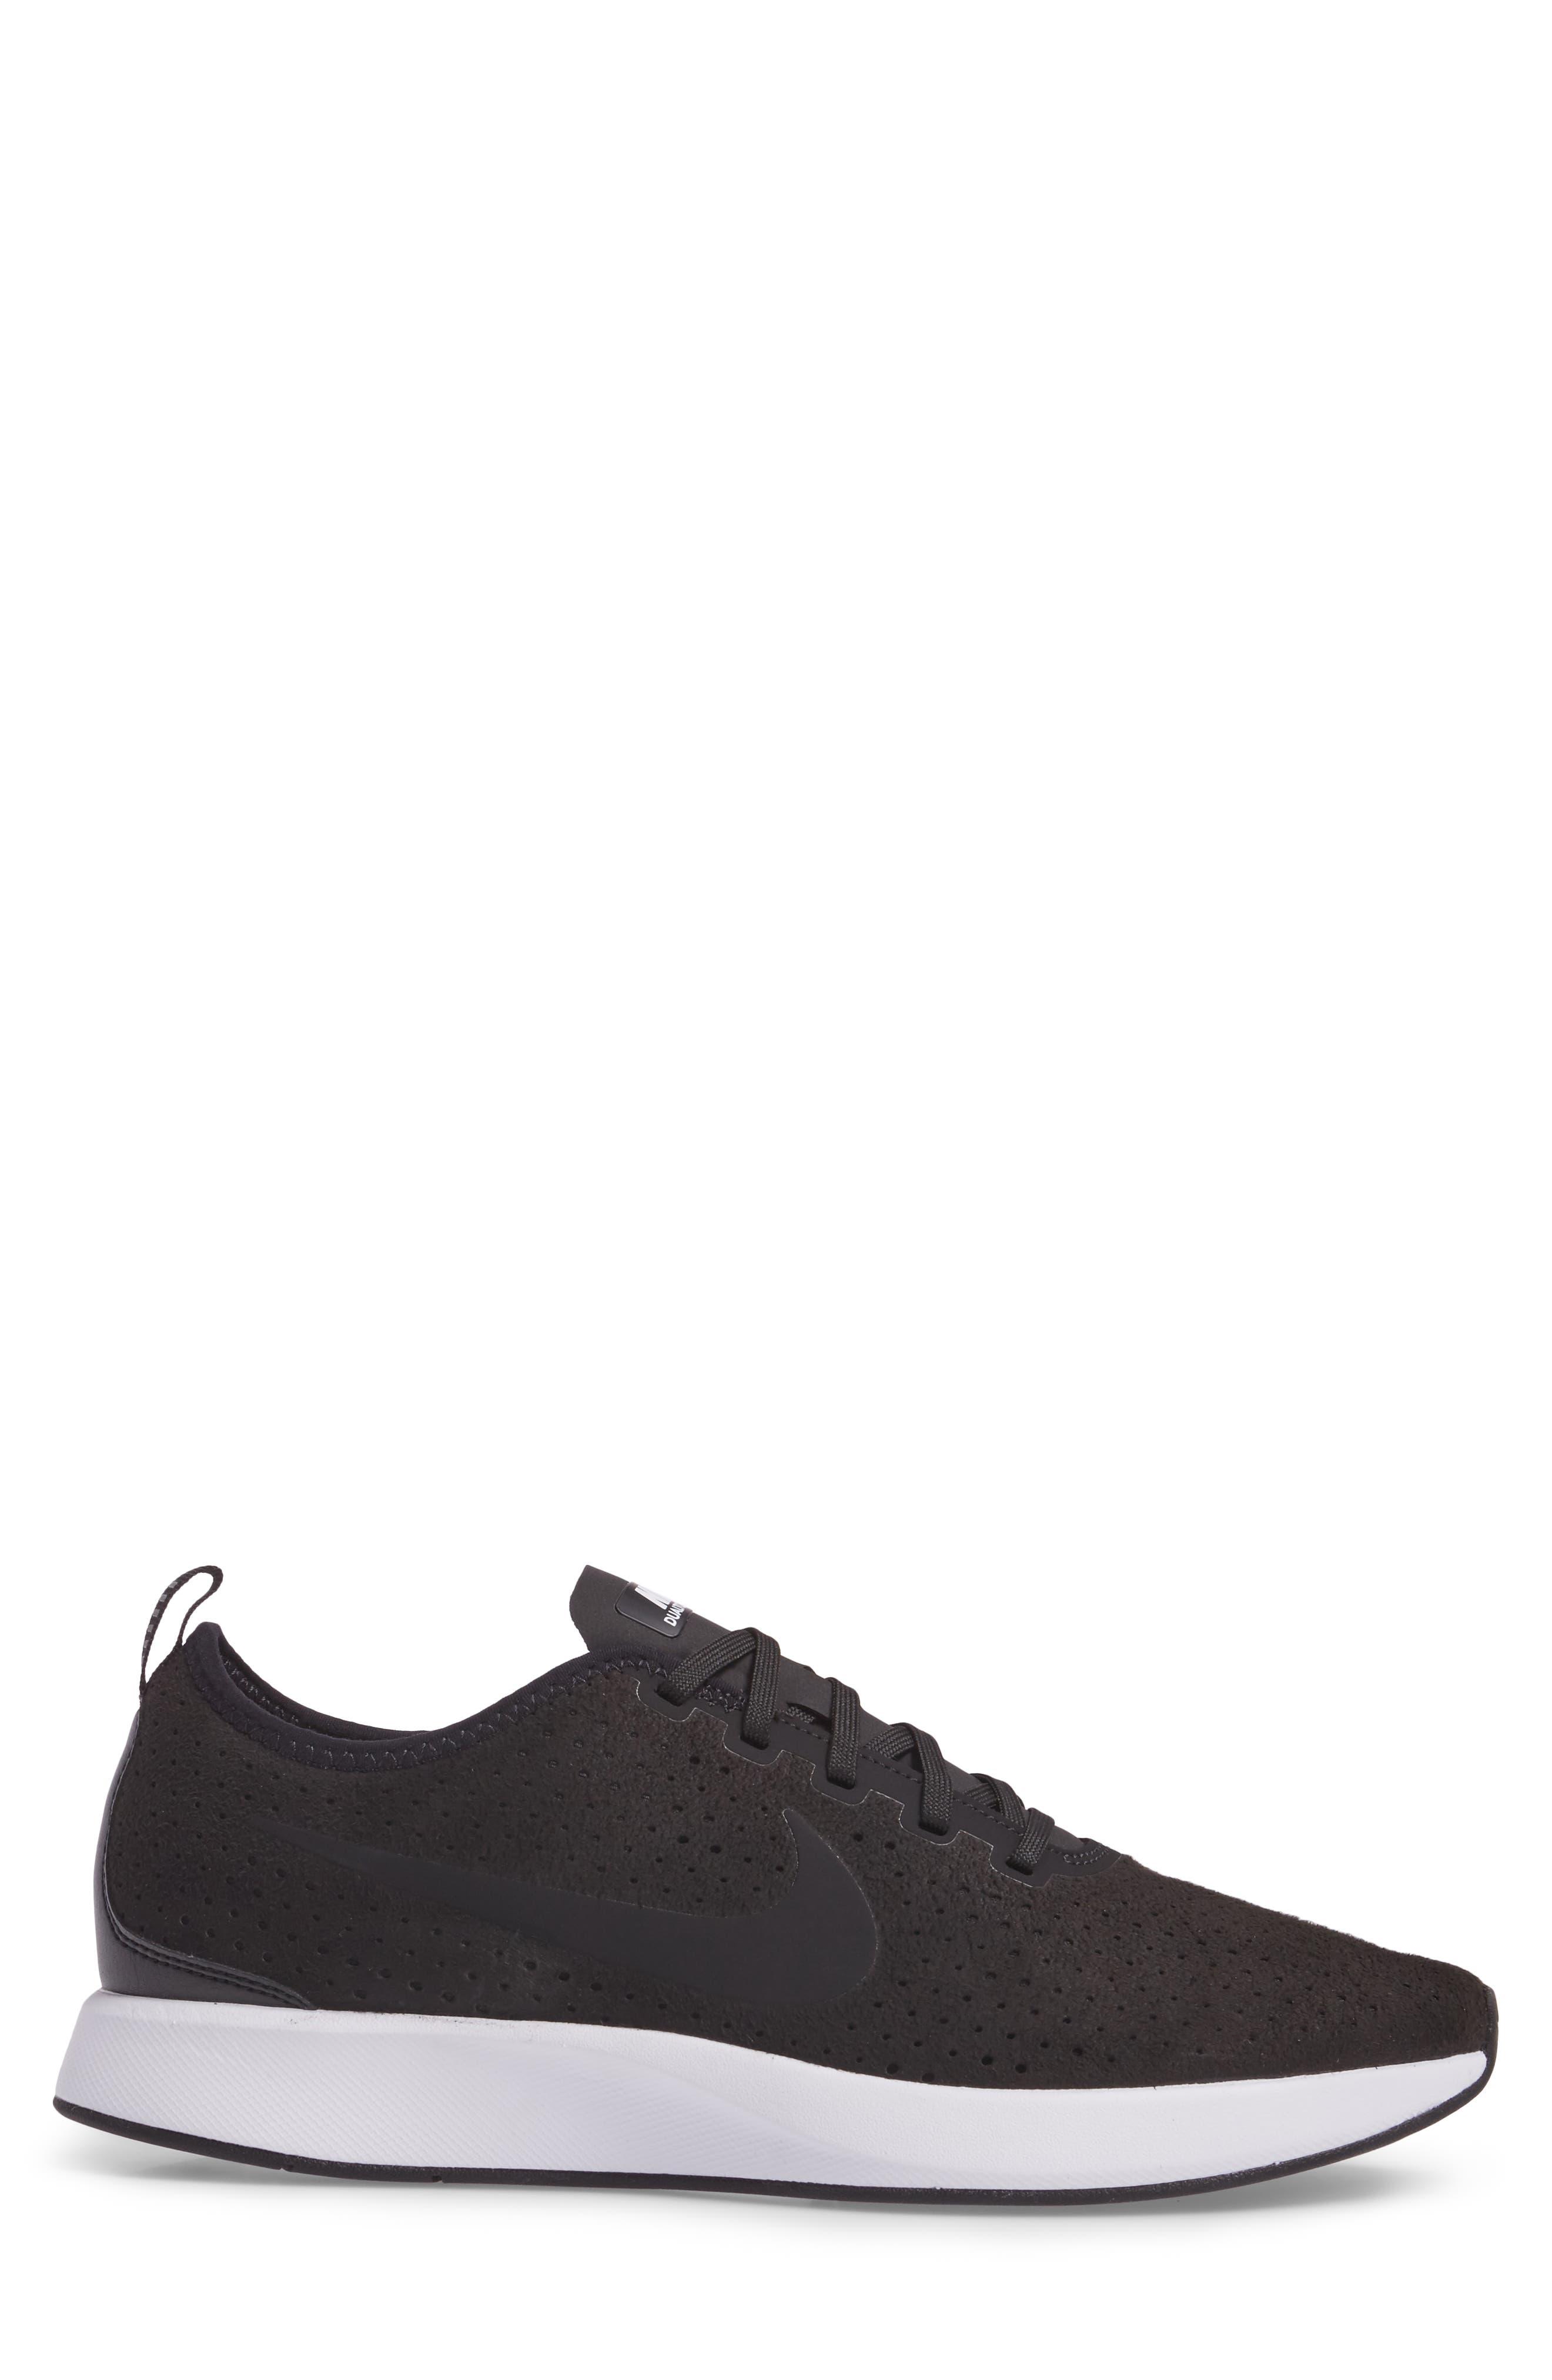 Dualtone Racer Premium Sneaker,                             Alternate thumbnail 3, color,                             Black/Black/White